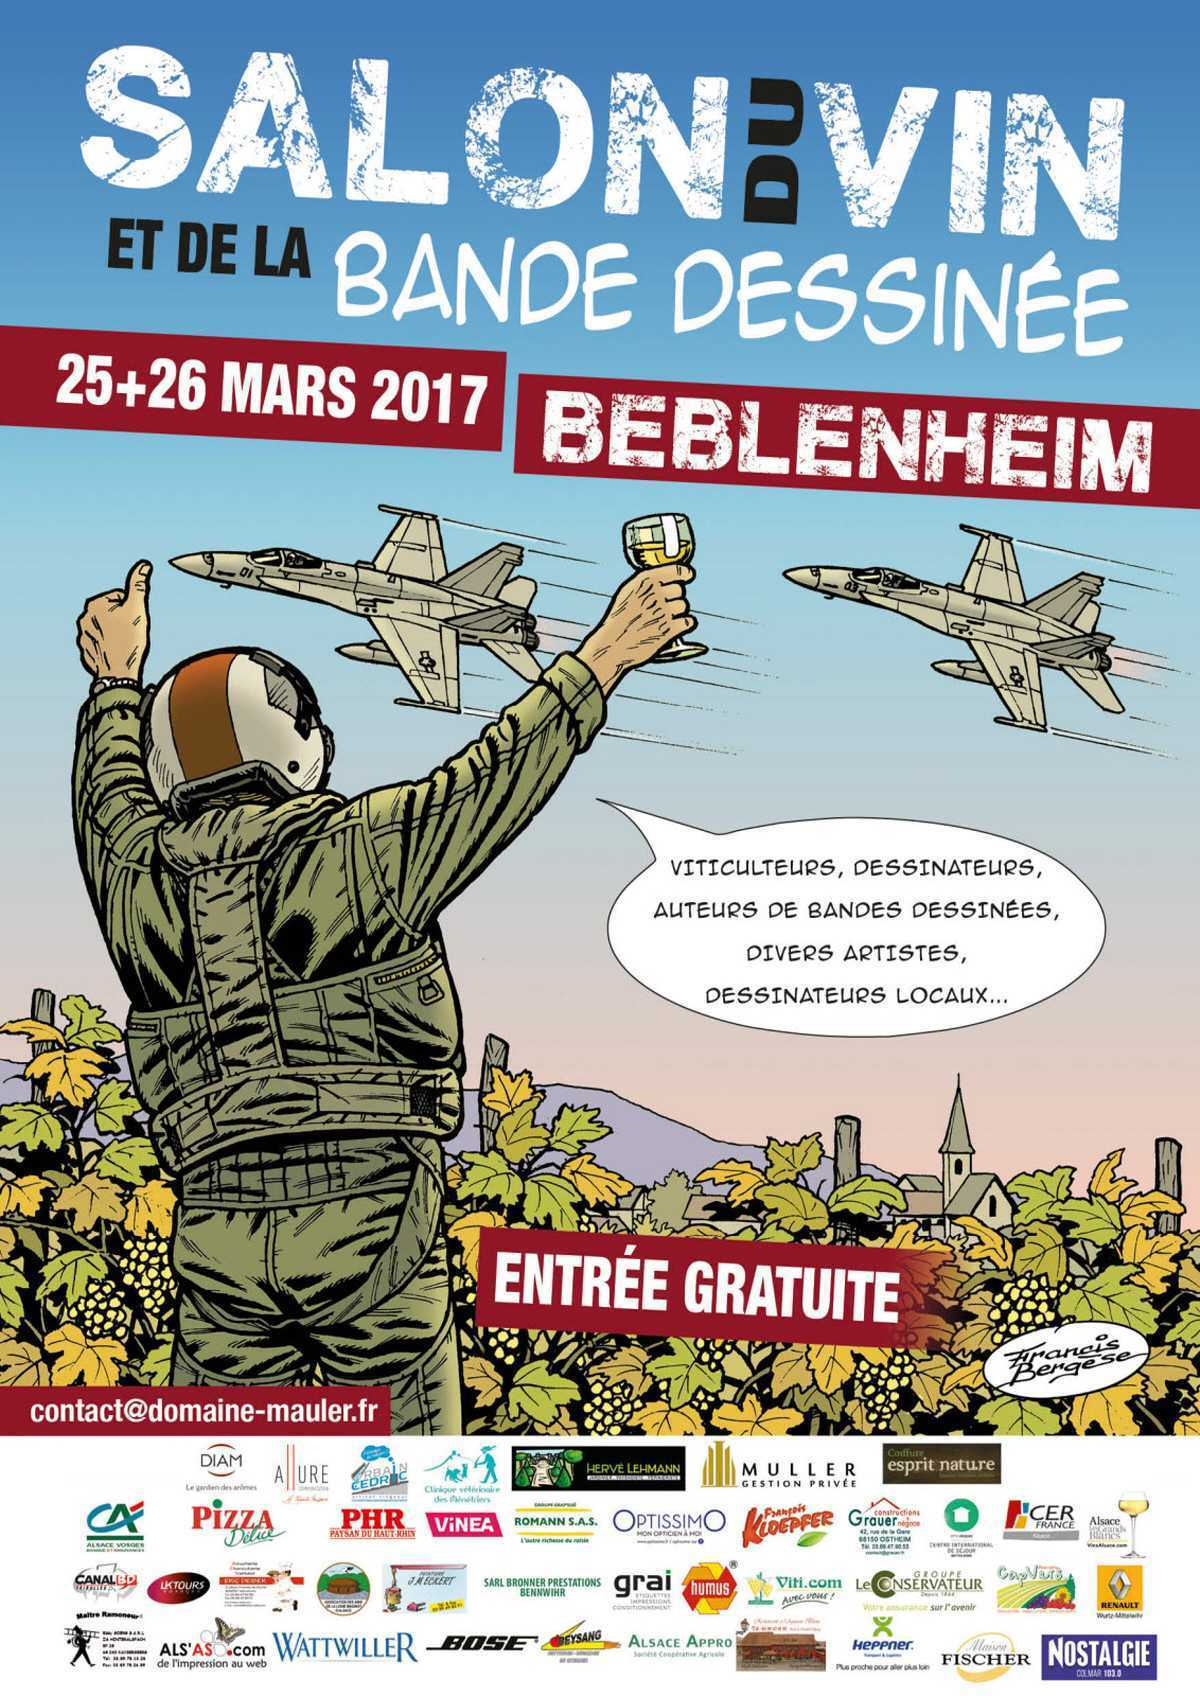 De Bulles en raisin 2017 à Beblenheim les 25 et 26 mars avec Bergèse et Buck Danny